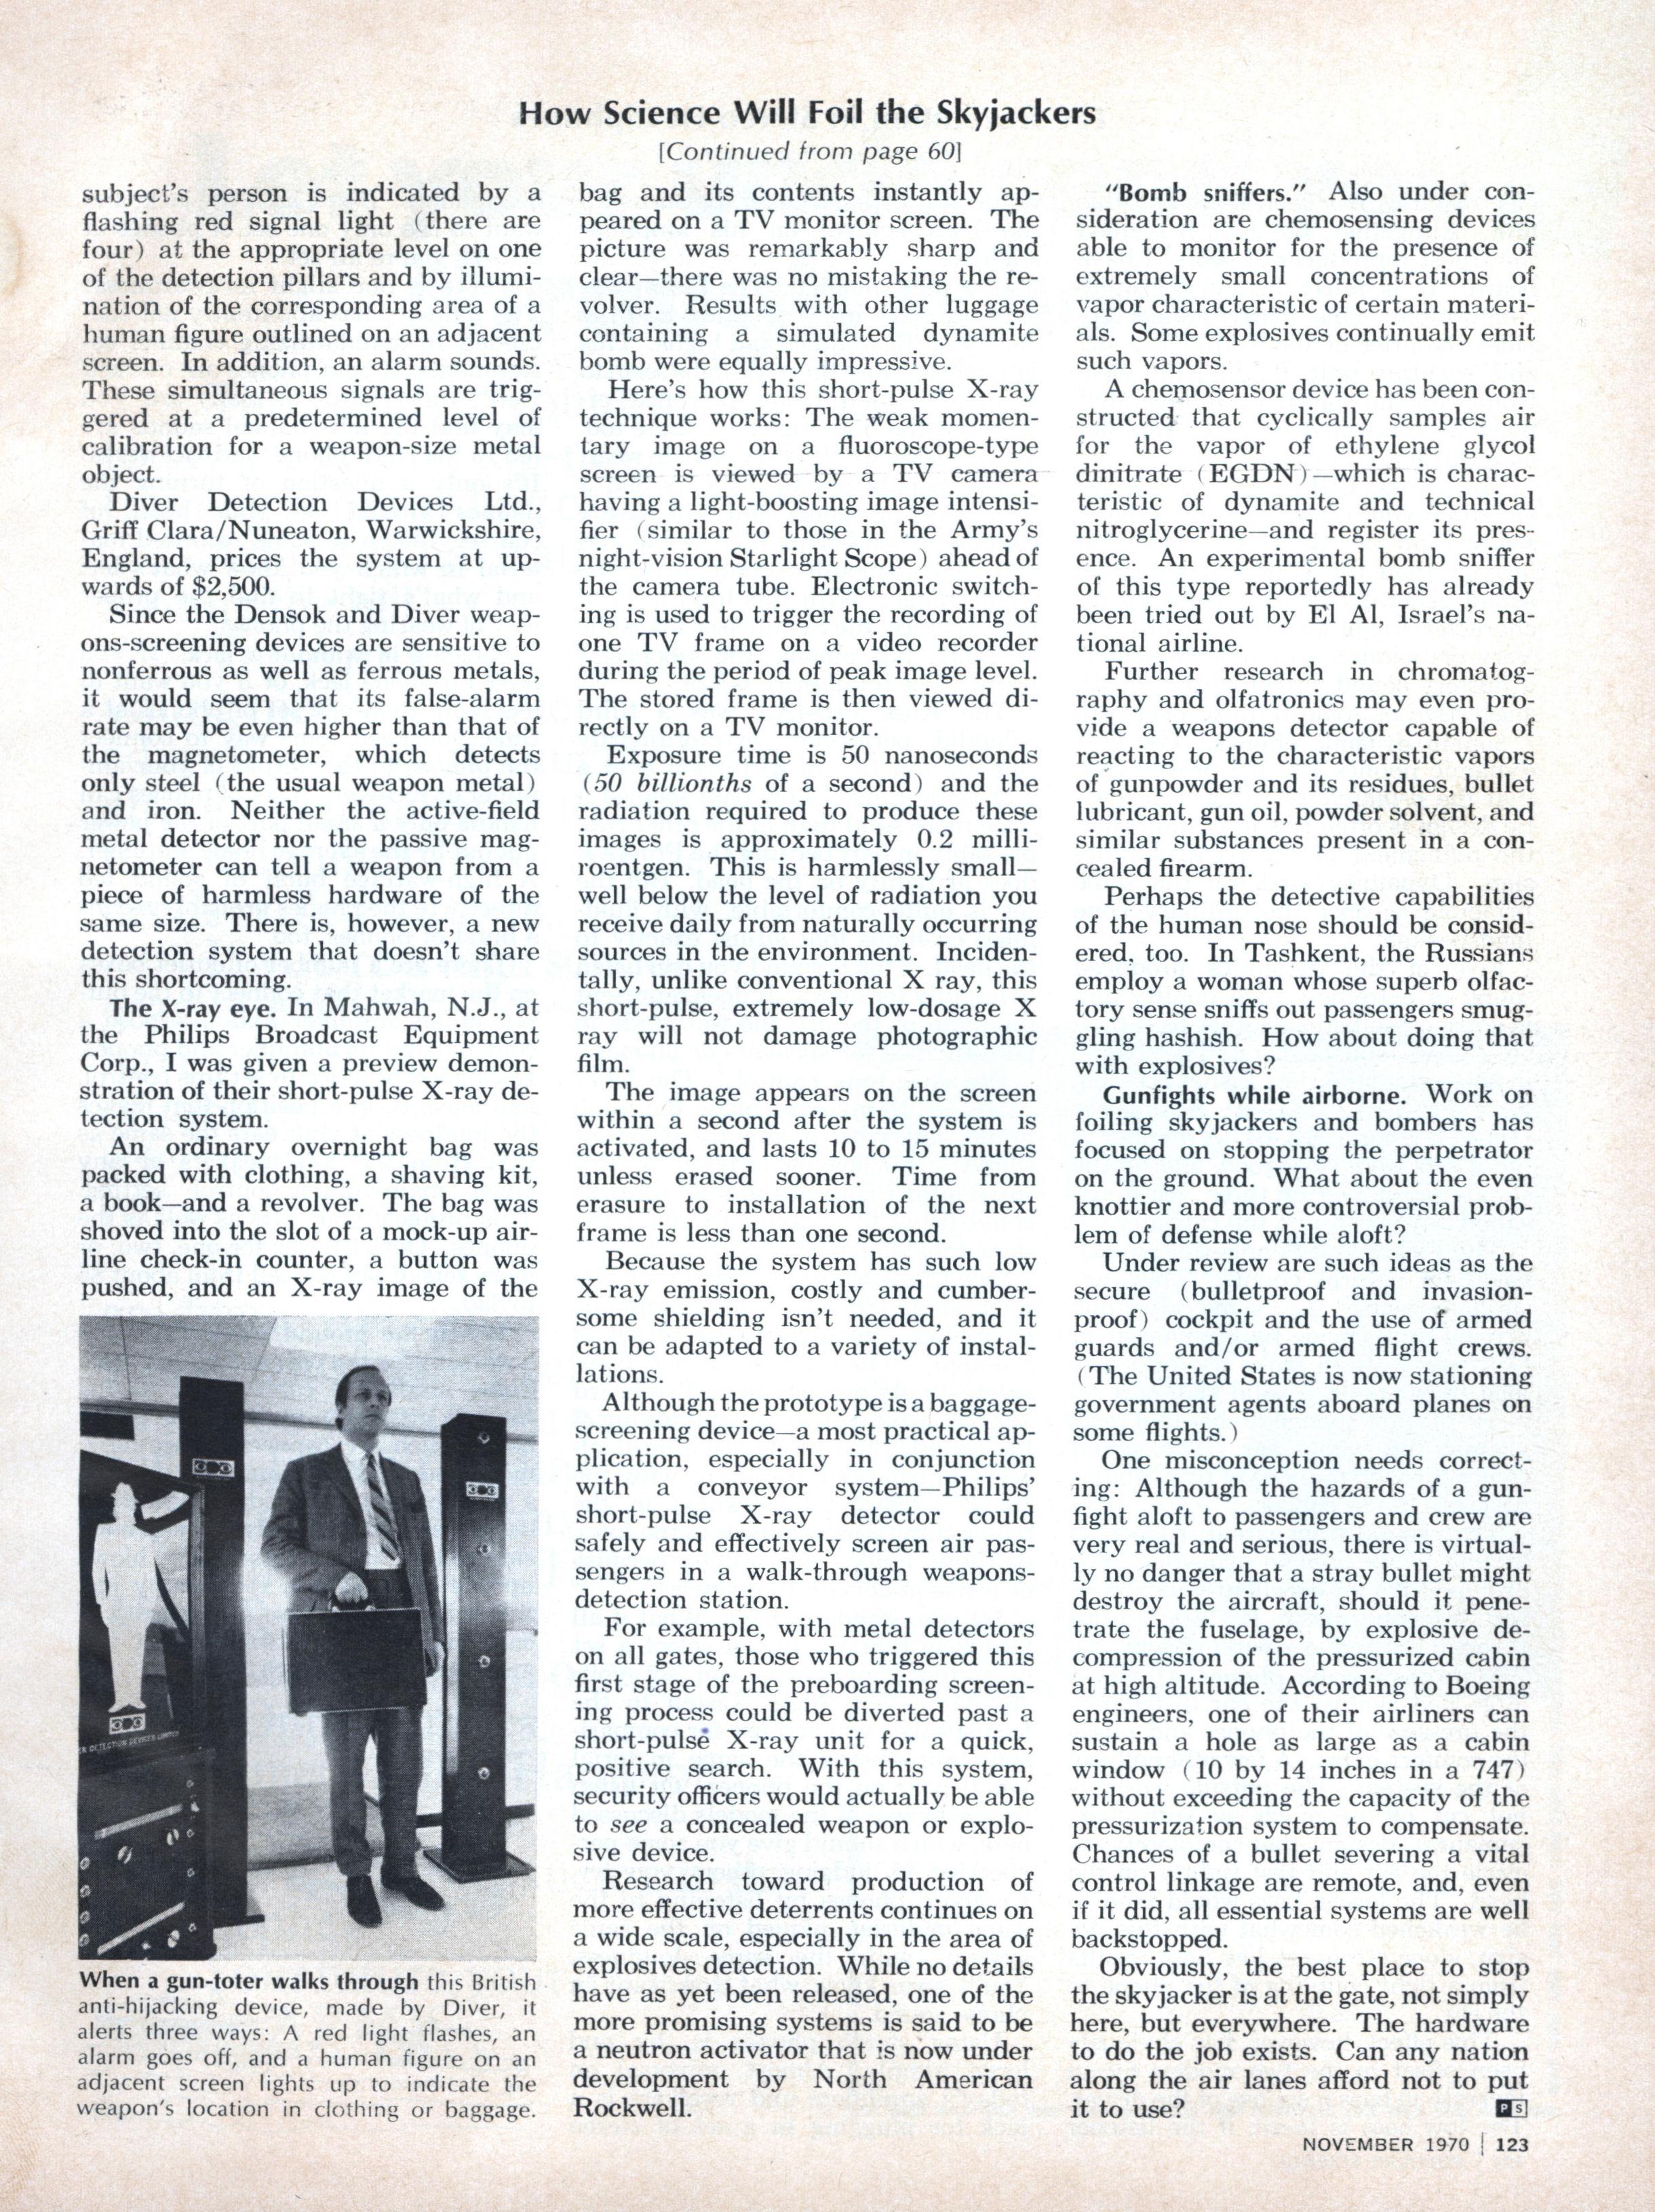 http://blog.modernmechanix.com/mags/PopularScience/11-1970/skyjackers/skyjackers_3.jpg